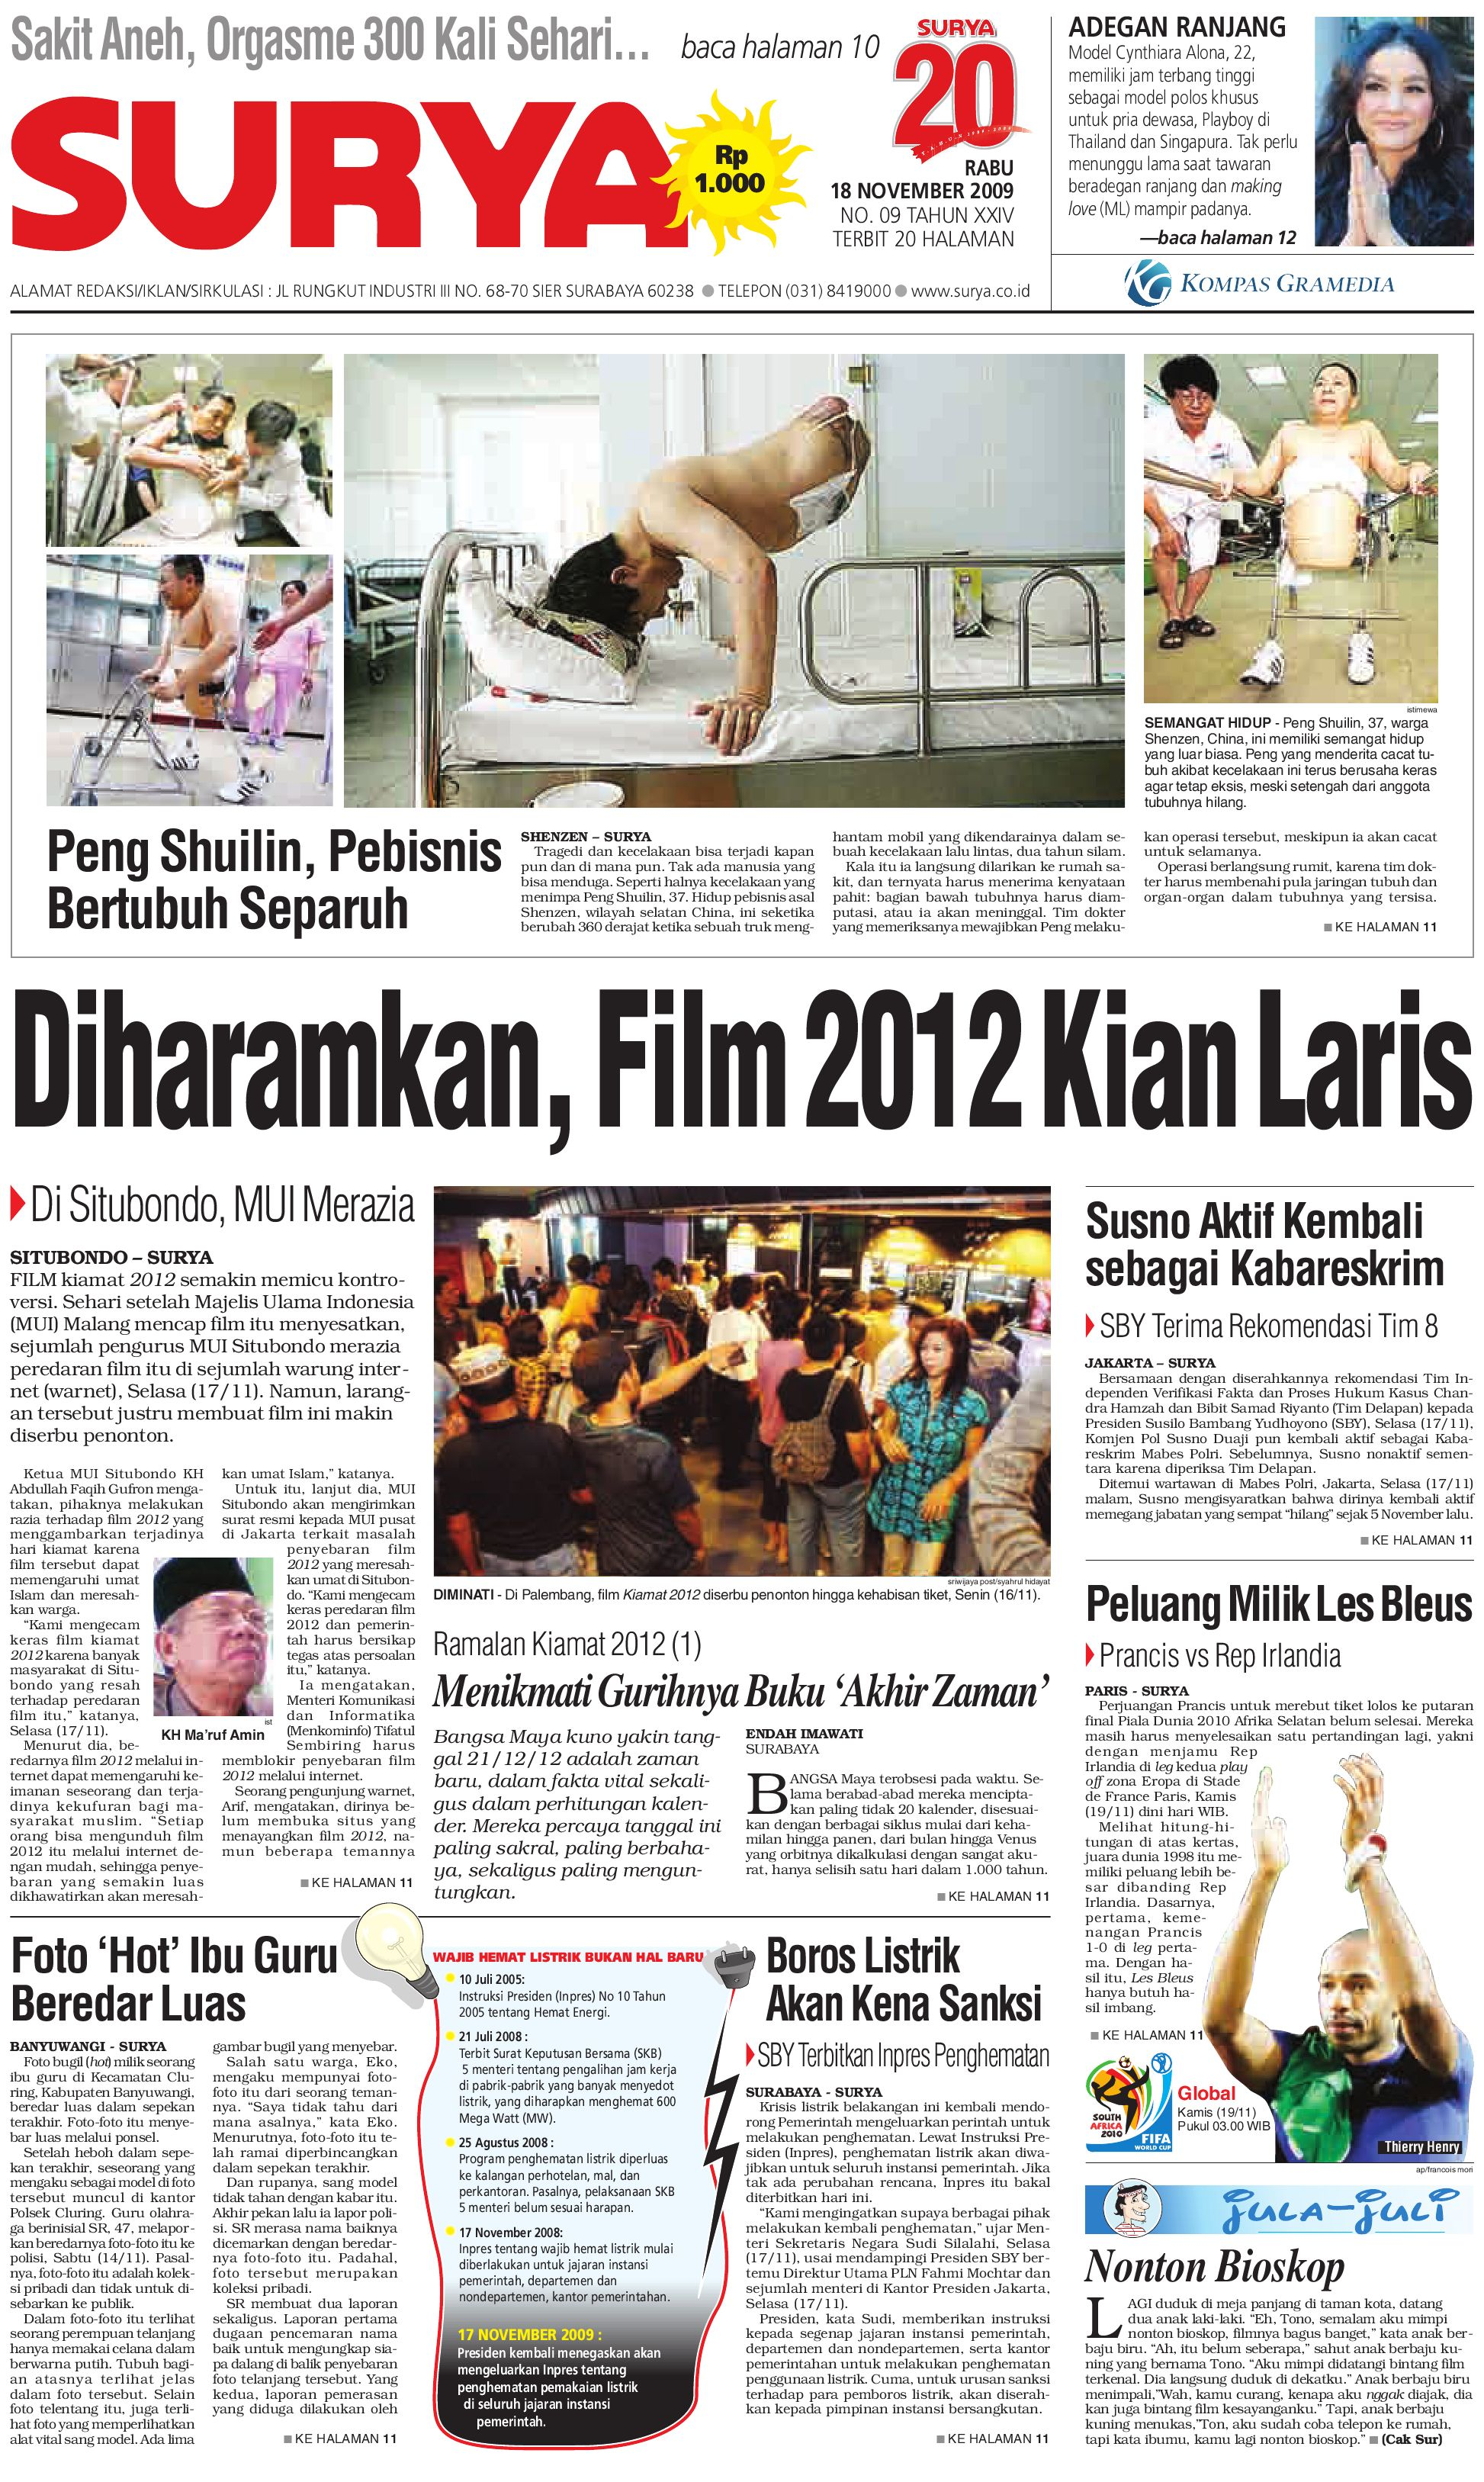 Surya Edisi Cetak 18 Nov 2009 by Harian SURYA - issuu dfbcac83bb